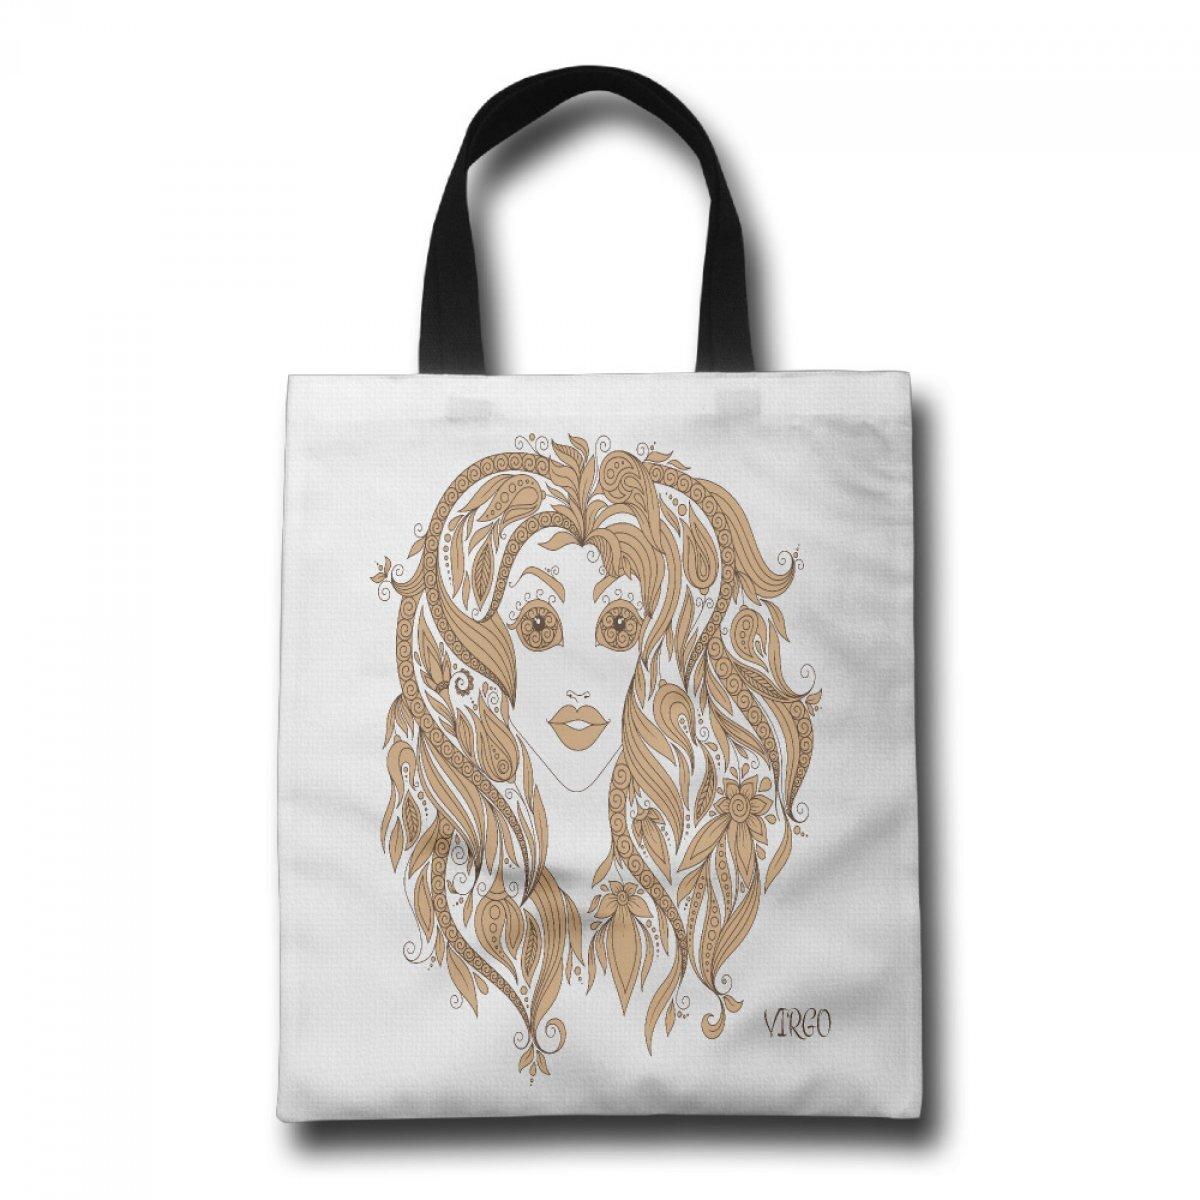 PhoRock Women Beach Tote Virgo Printed Canvas Tote Bag GWXZ019 0